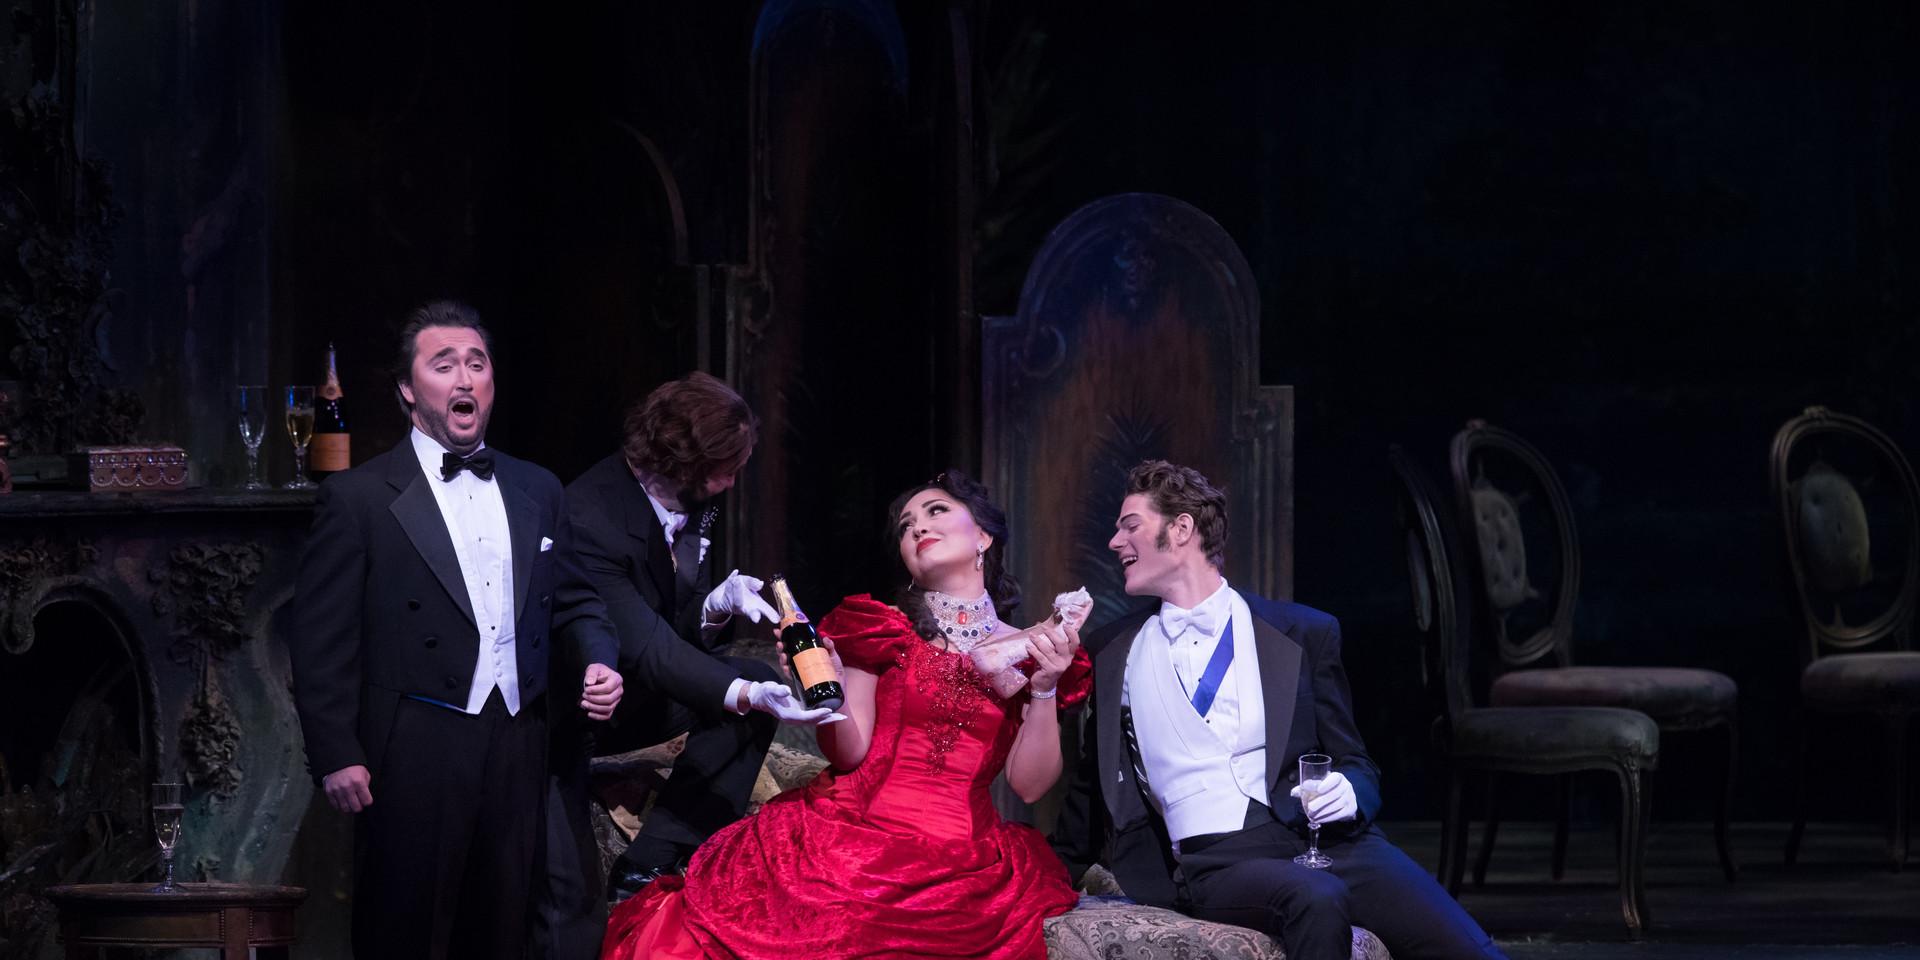 Photo by Bruce R. Bennett, for Palm Beach Opera